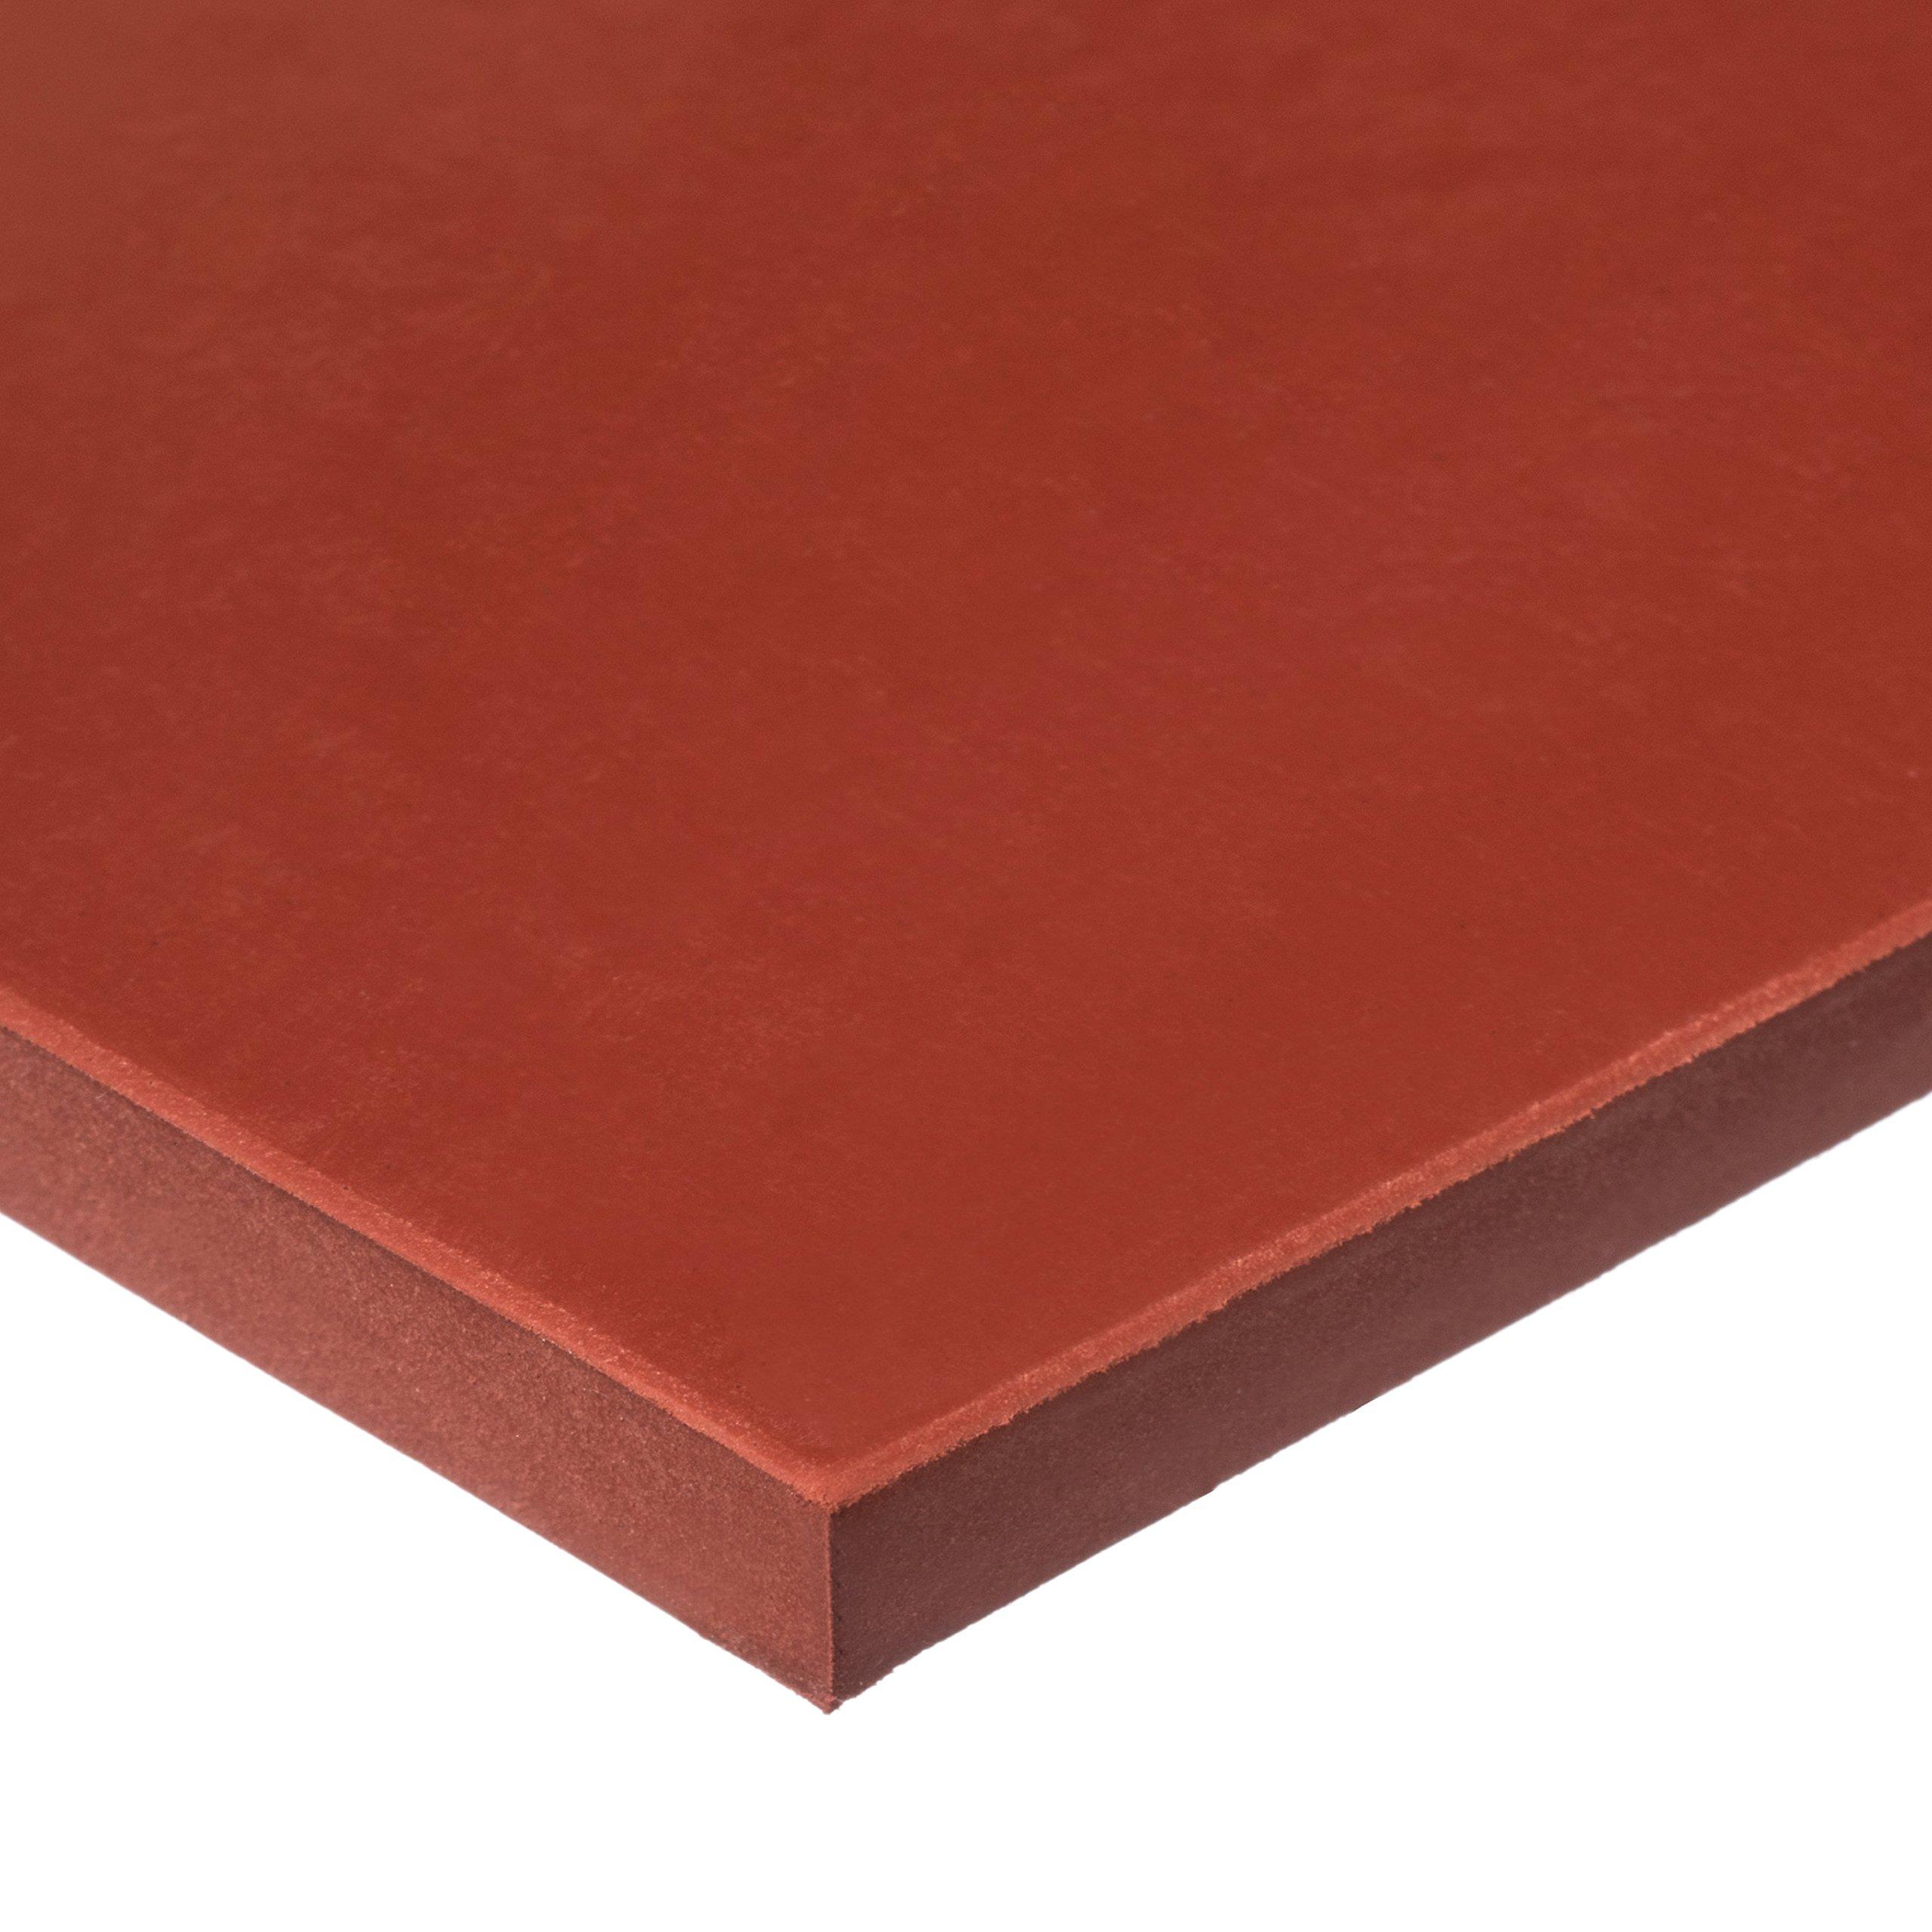 Silicone Rubber Sheet No PSA-40A -1/16'' T x 36''W x 12''